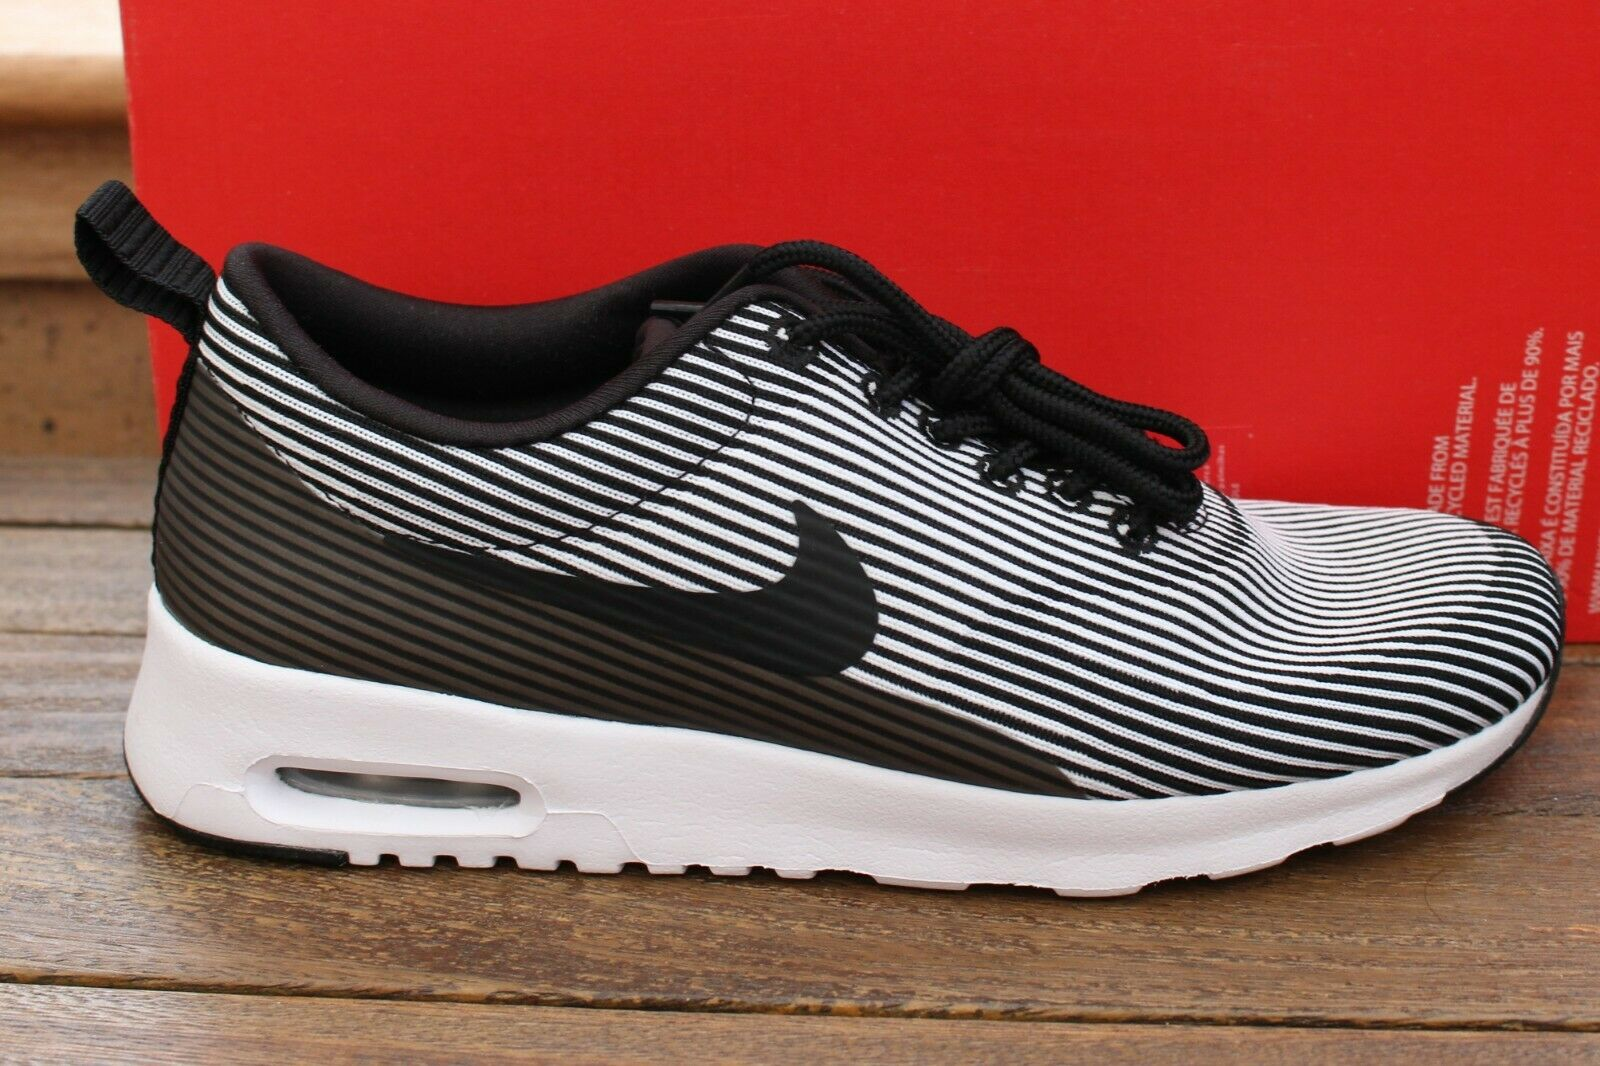 damen Nike Air Max Thea KJCRD Trainers 718646-003 UK sz's 4 & 5